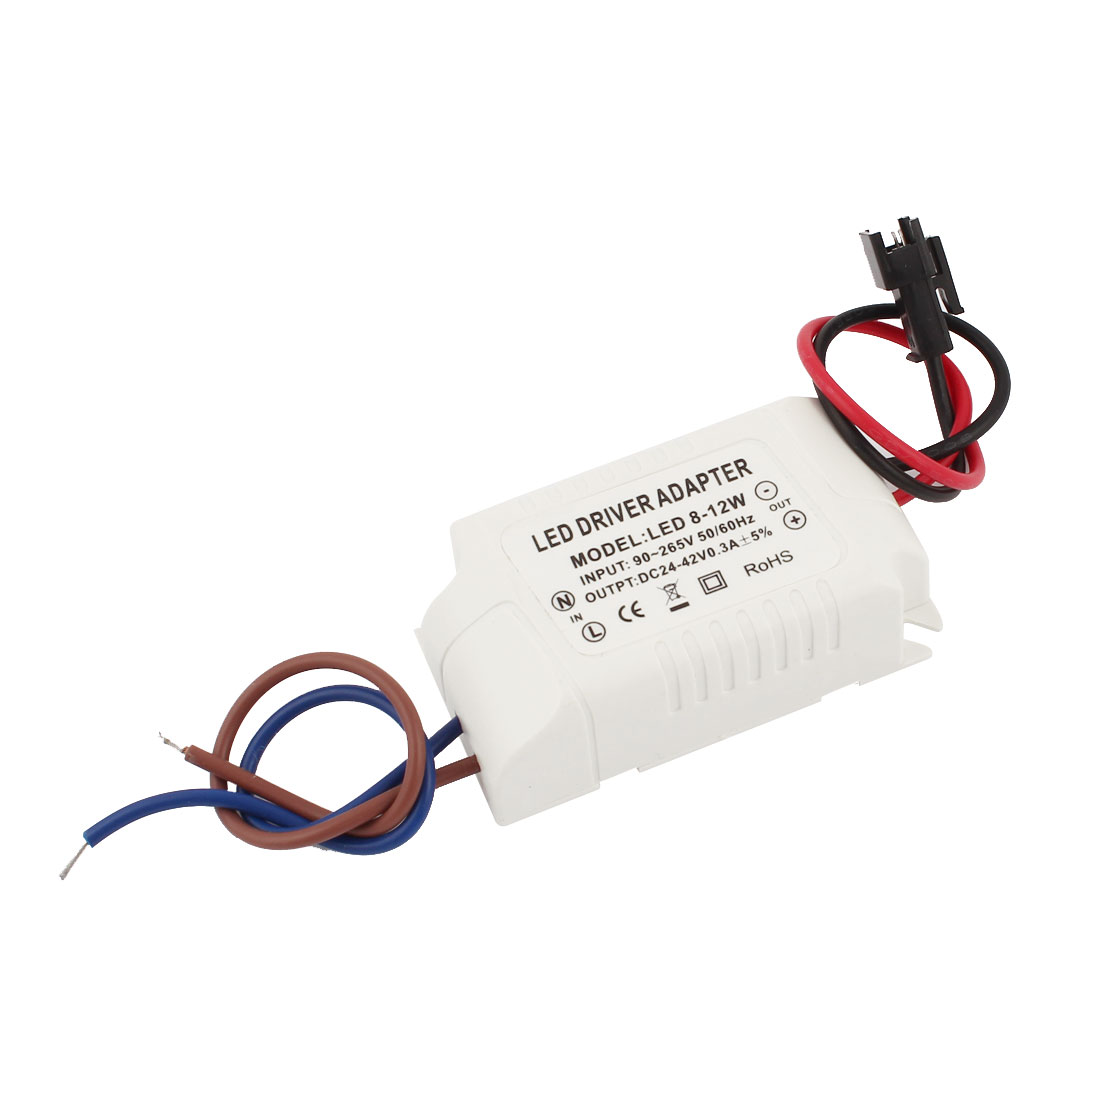 AC 90-265V to DC 24-42V 0.3A 8-12x1W Power Supply Transformer Driver Adapter for LED Light